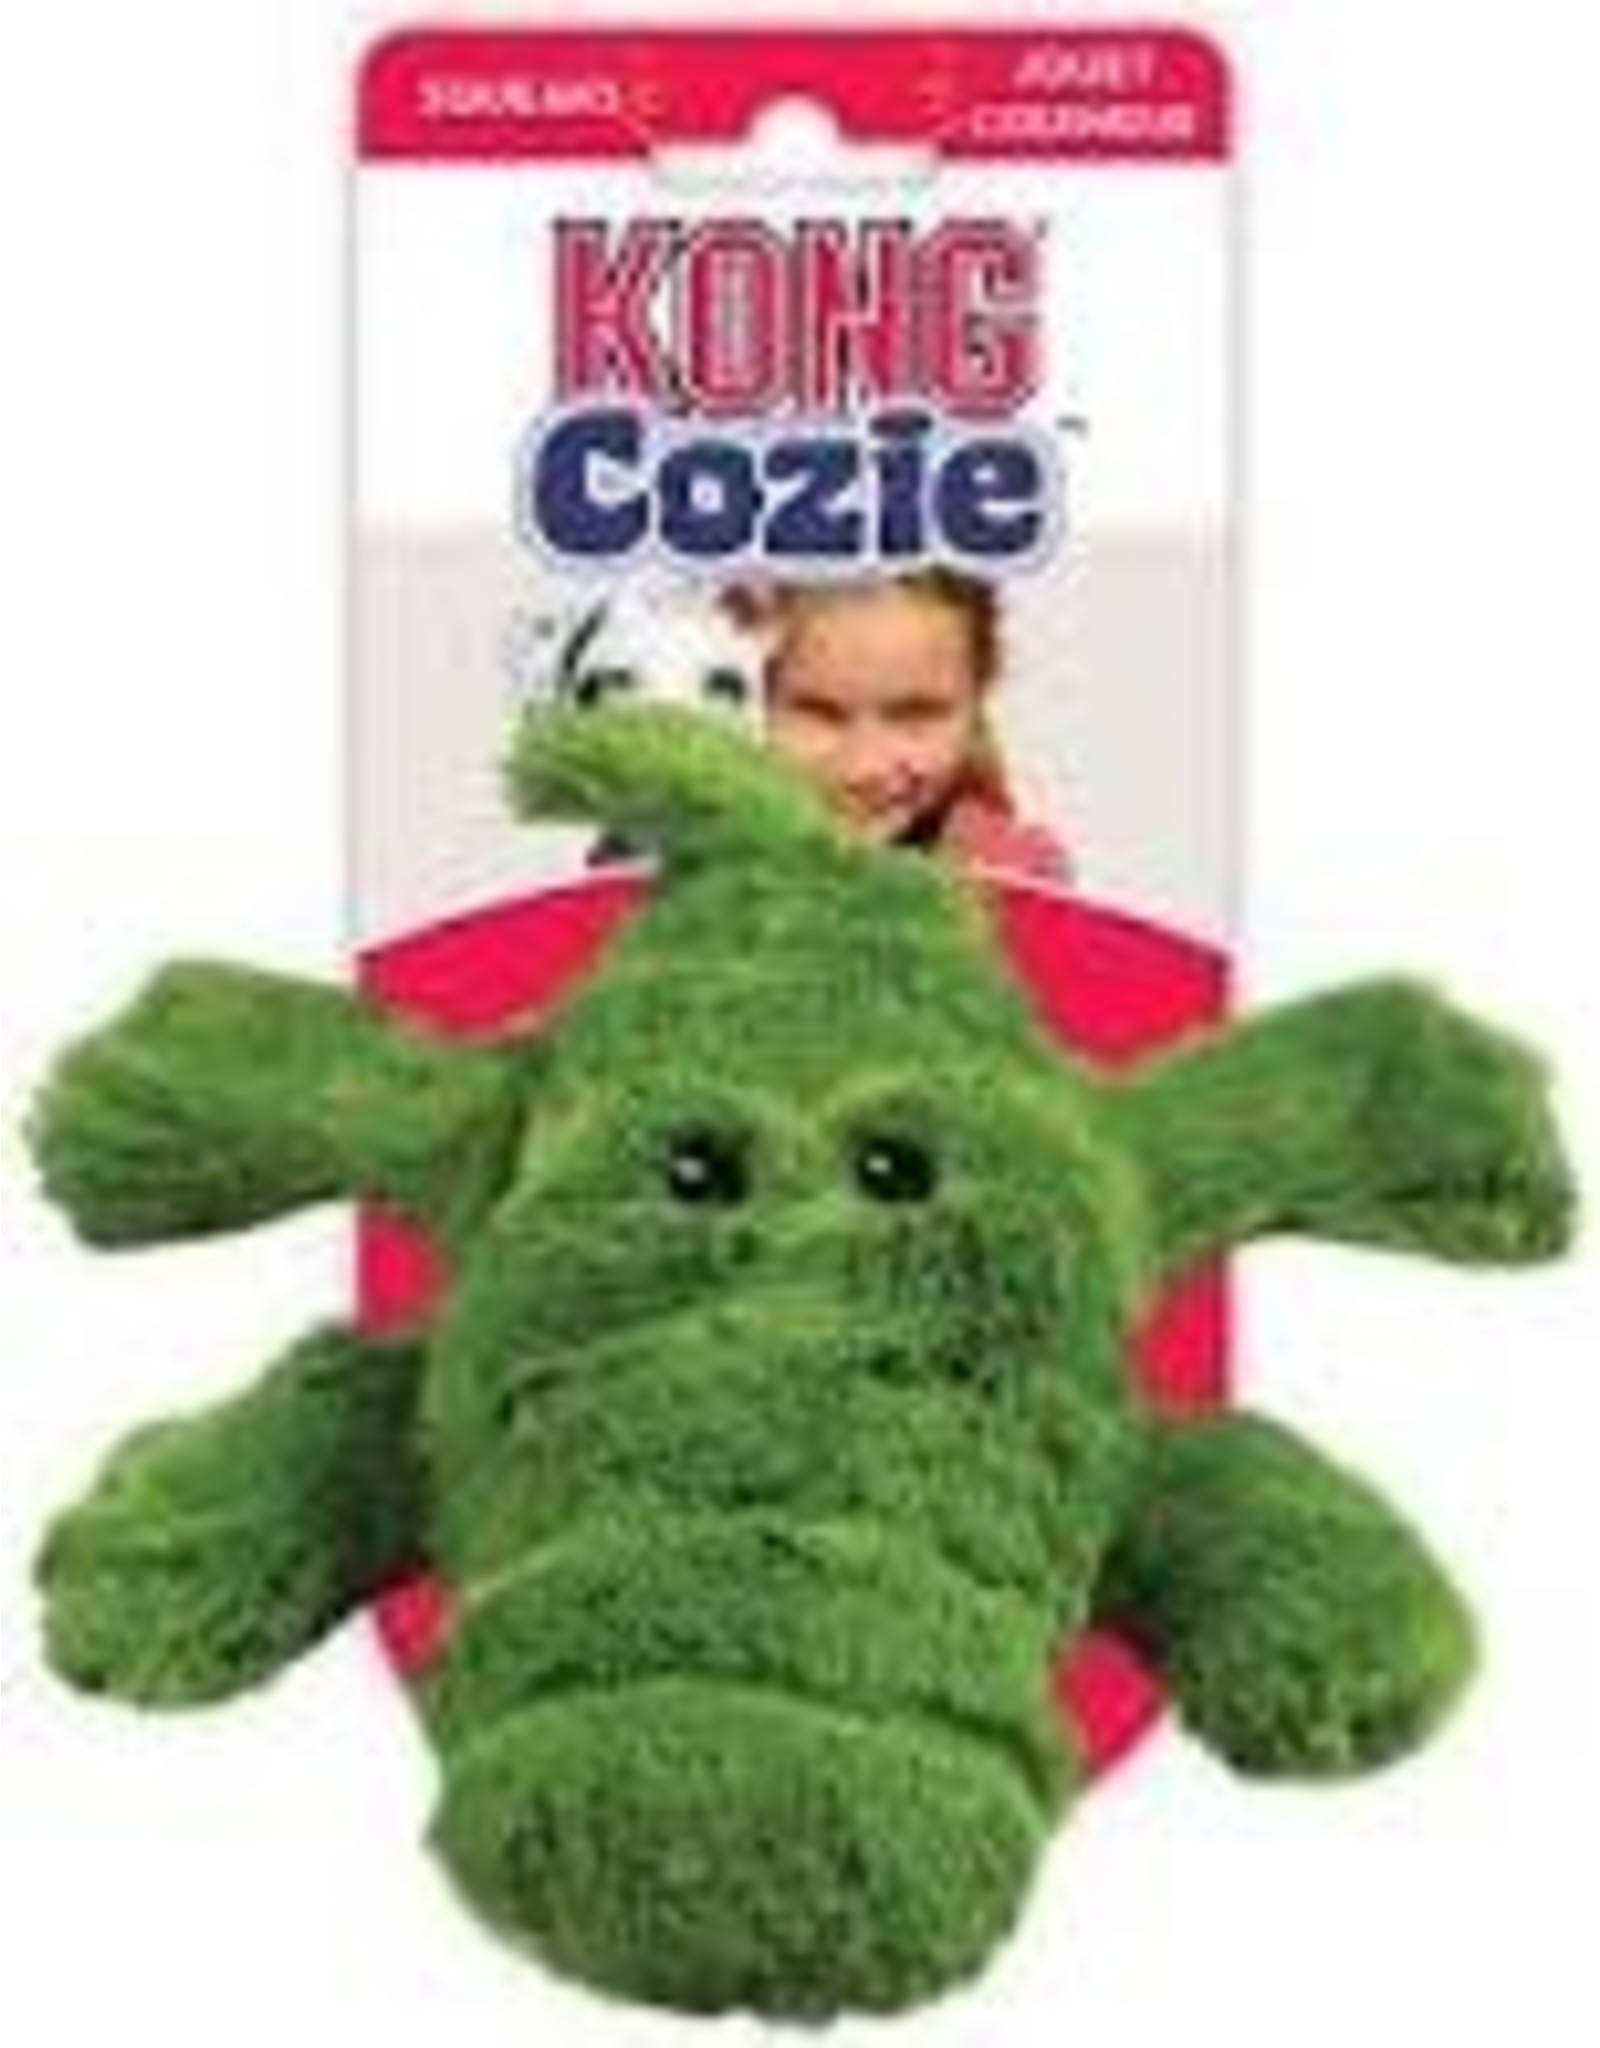 Kong Kong - Cozie Alligator